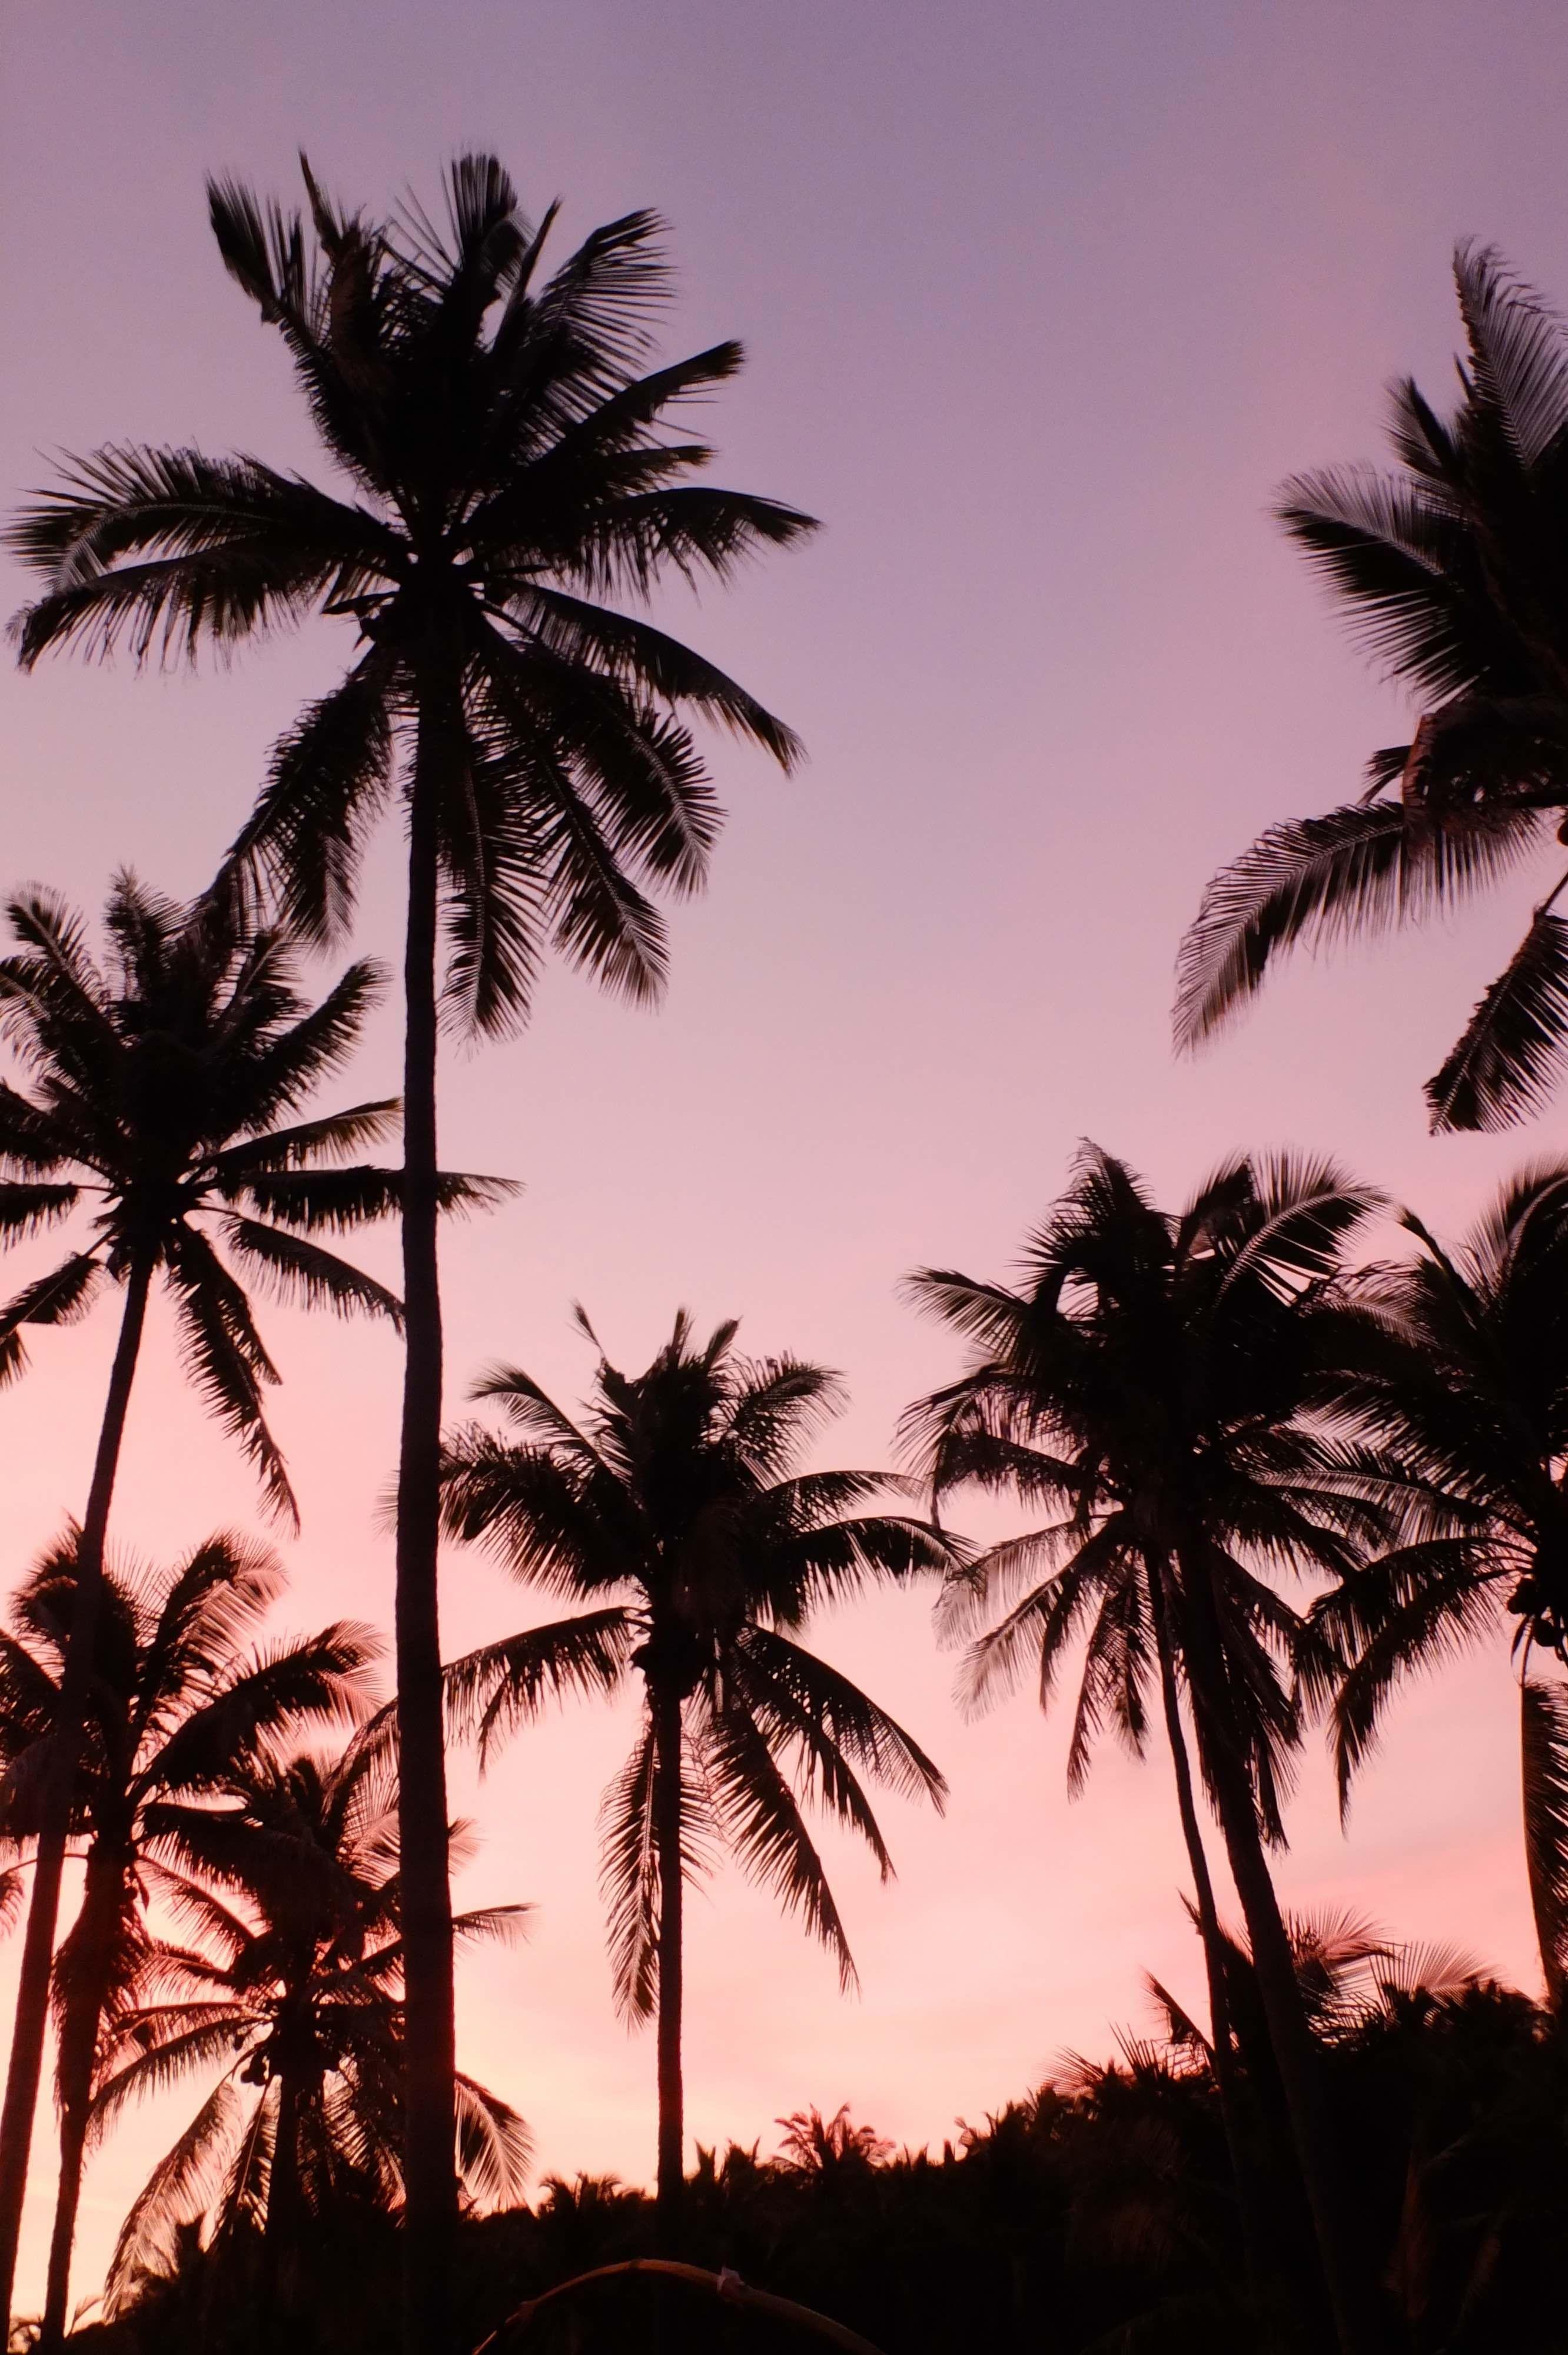 Sunset In Pink Violet Blue Coulours Pastels Pk214 Fondos De Pantalla Palmeras Fondos De Palmeras Fondos Para Iphone